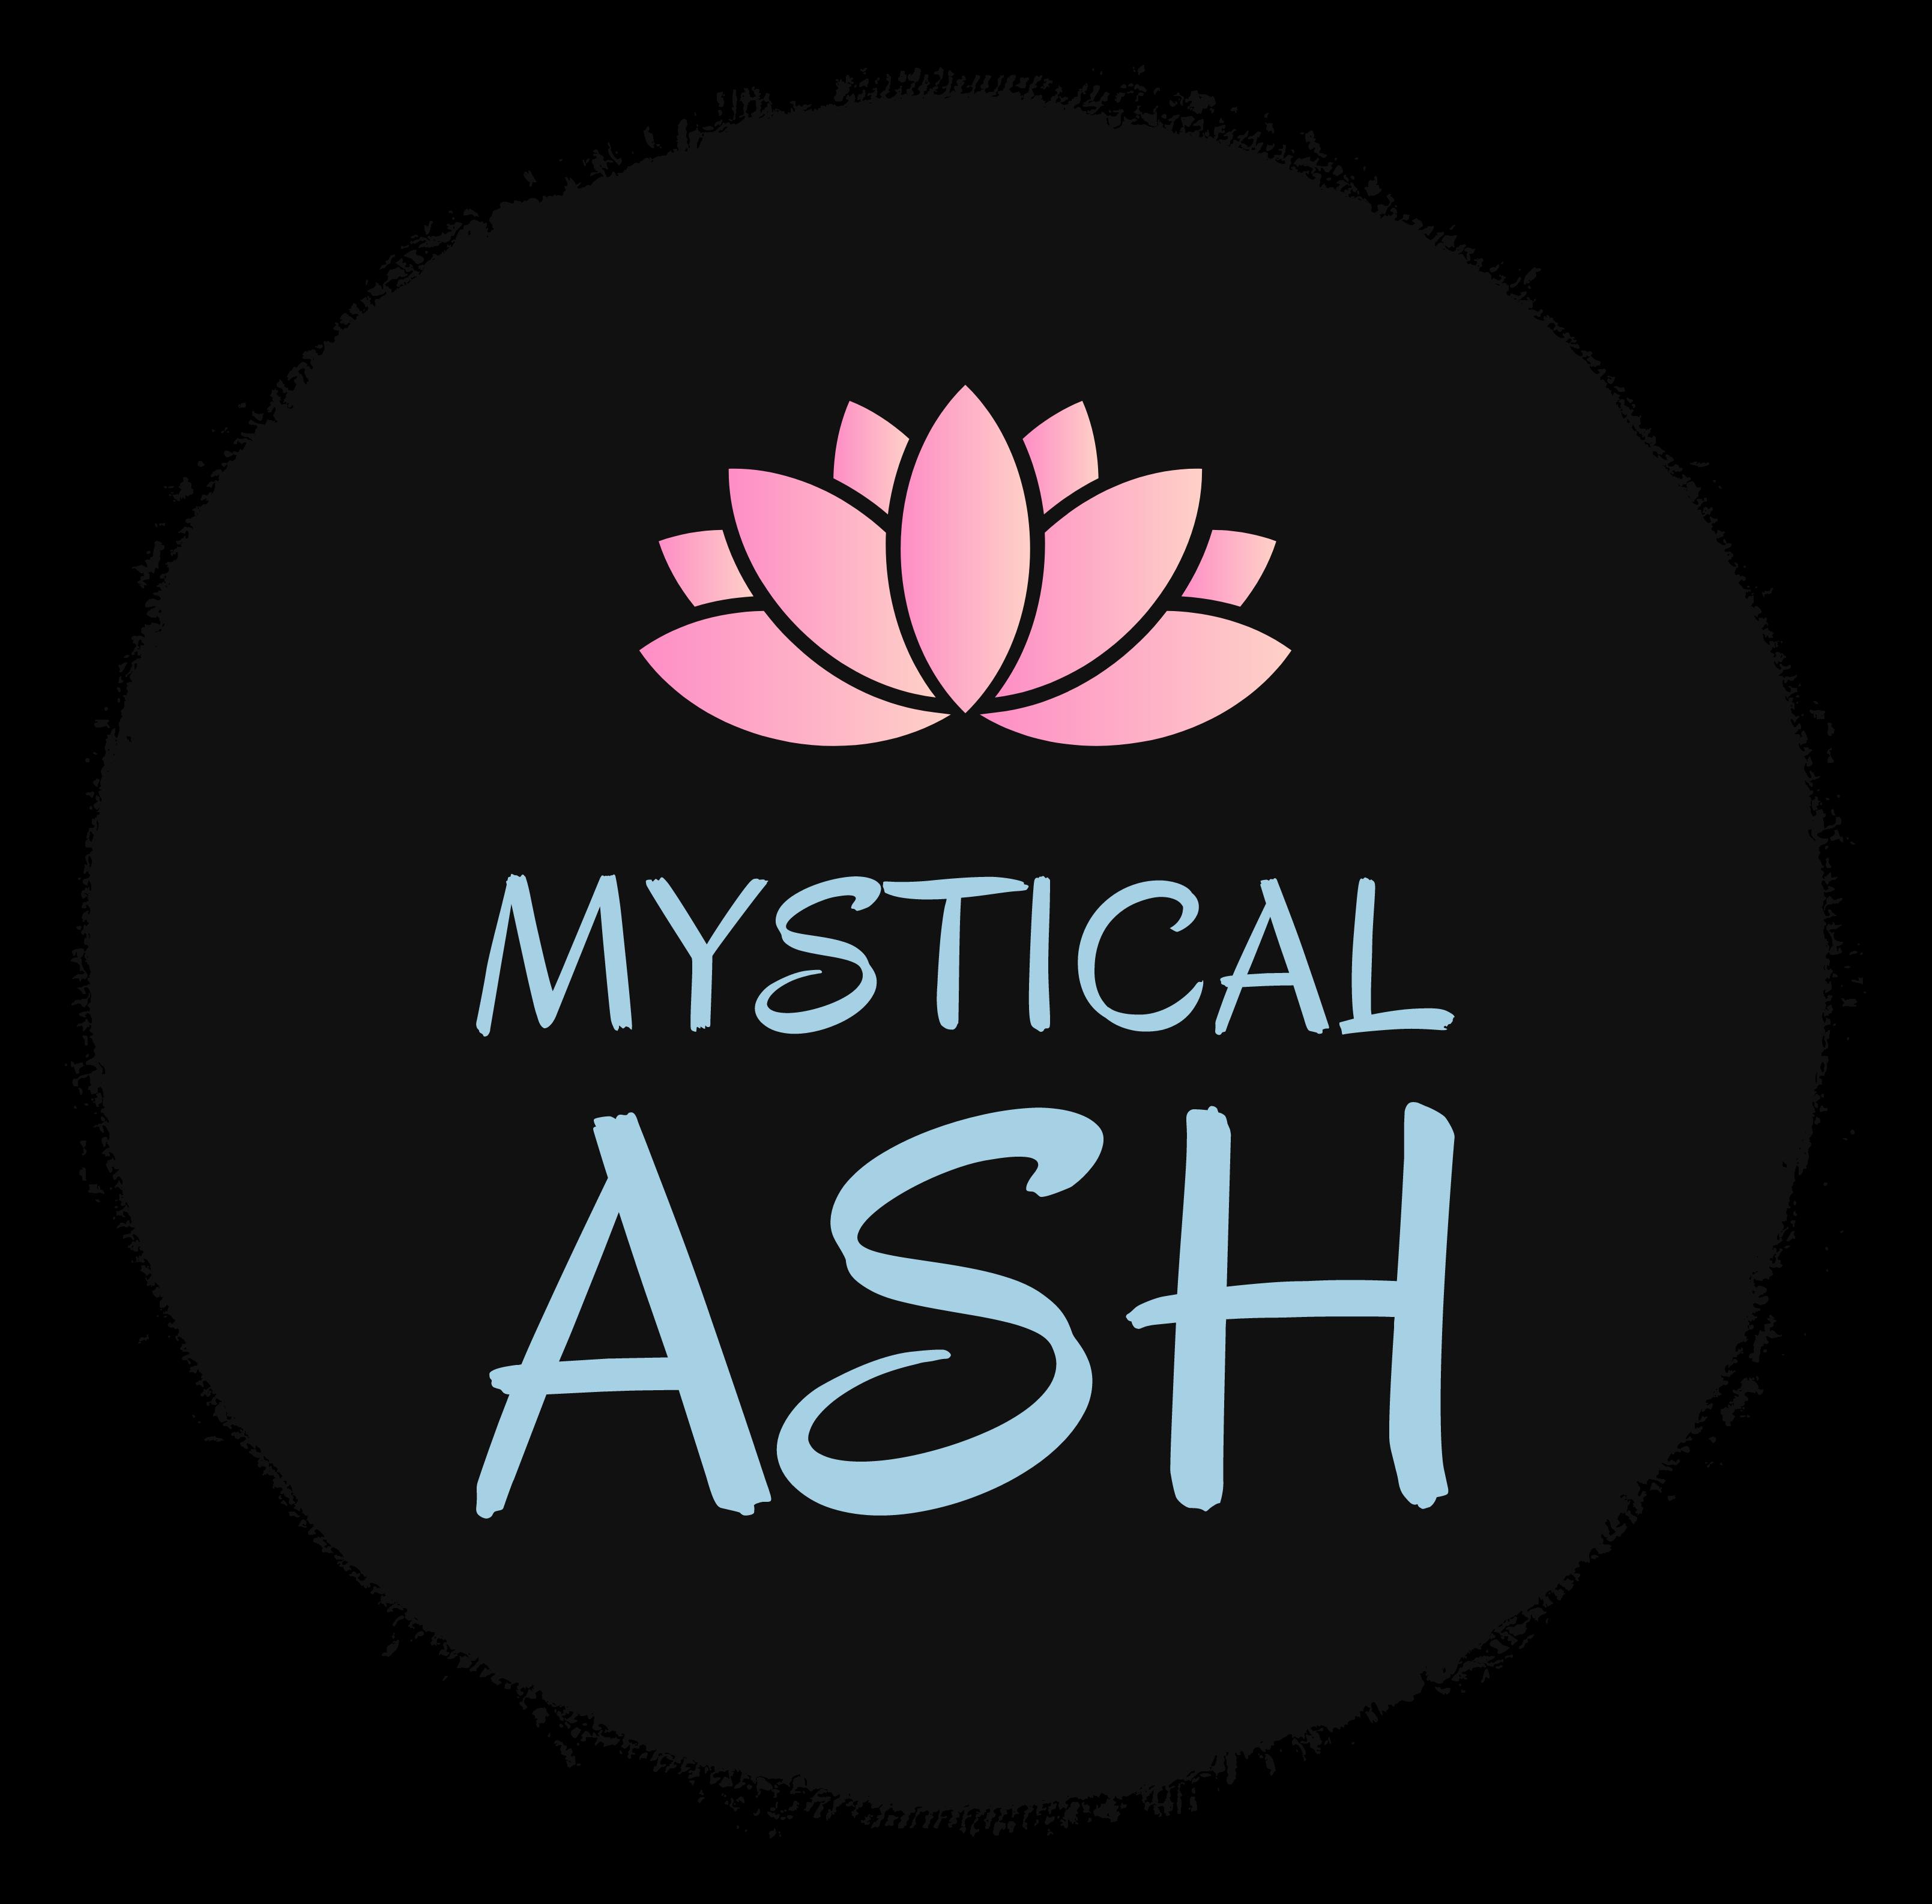 Mystical Ash